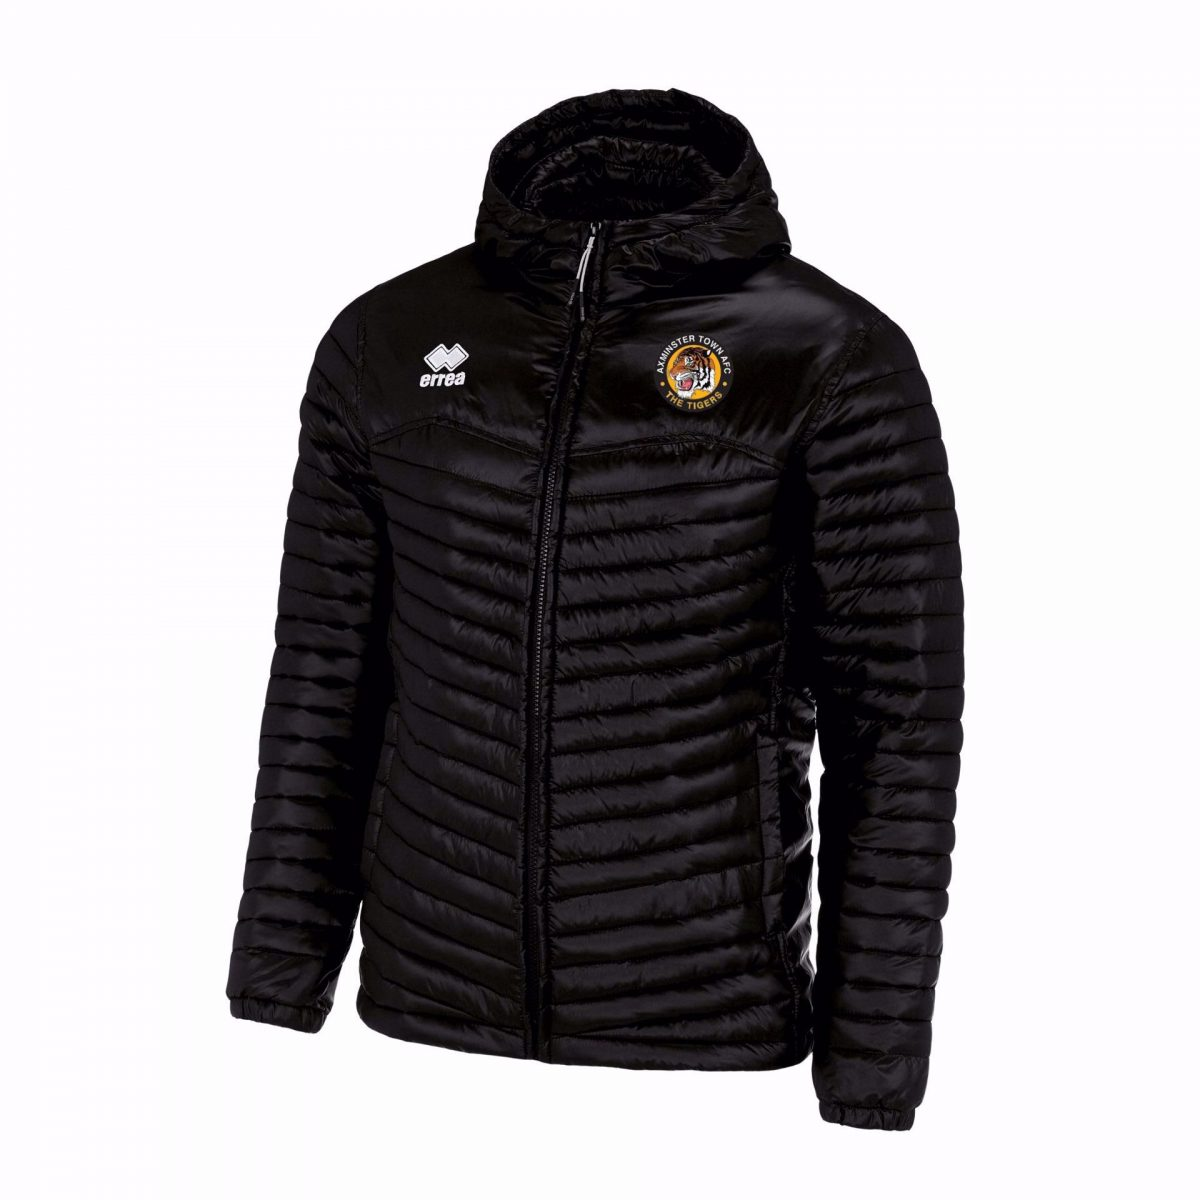 Axminster Town AFC Errea ADULT GORNER Jacket FJOBOZ